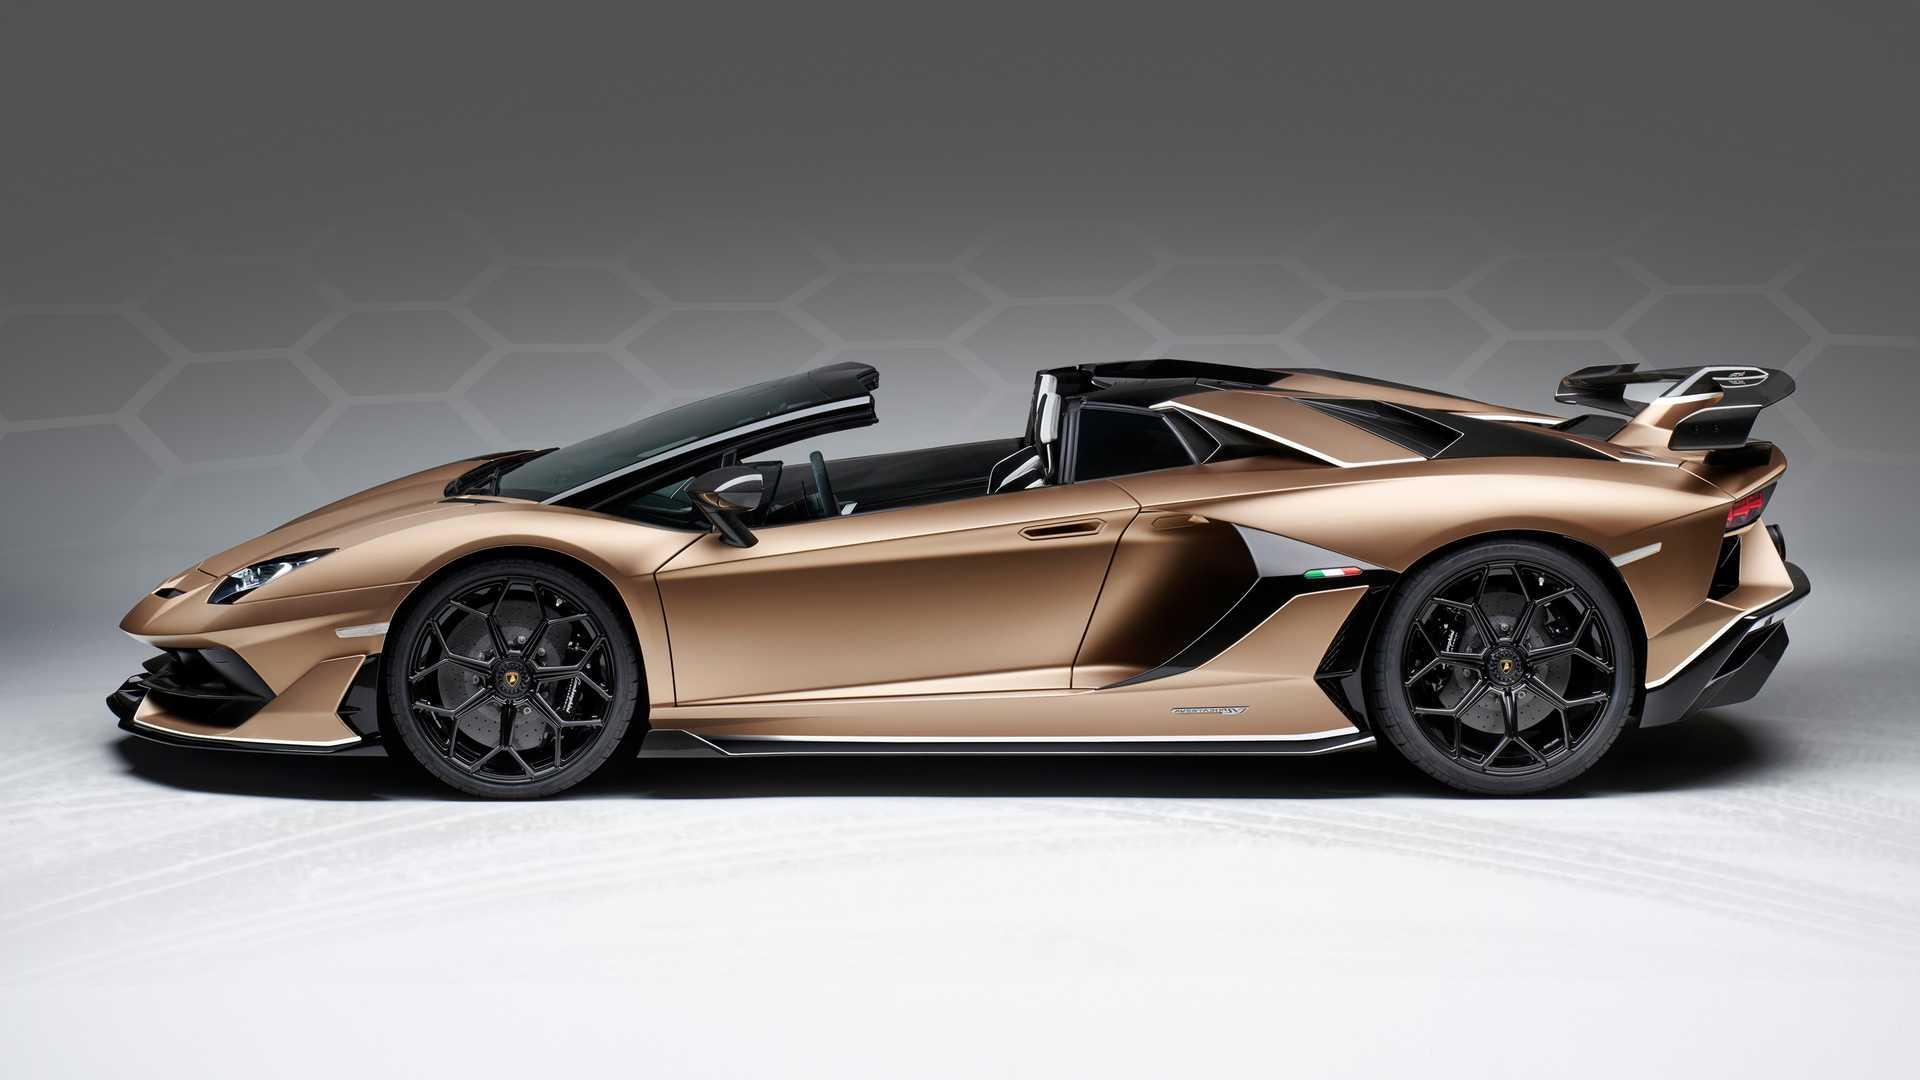 2020 Lamborghini Aventador Svj Roadster Side Wallpaper 27 Hd